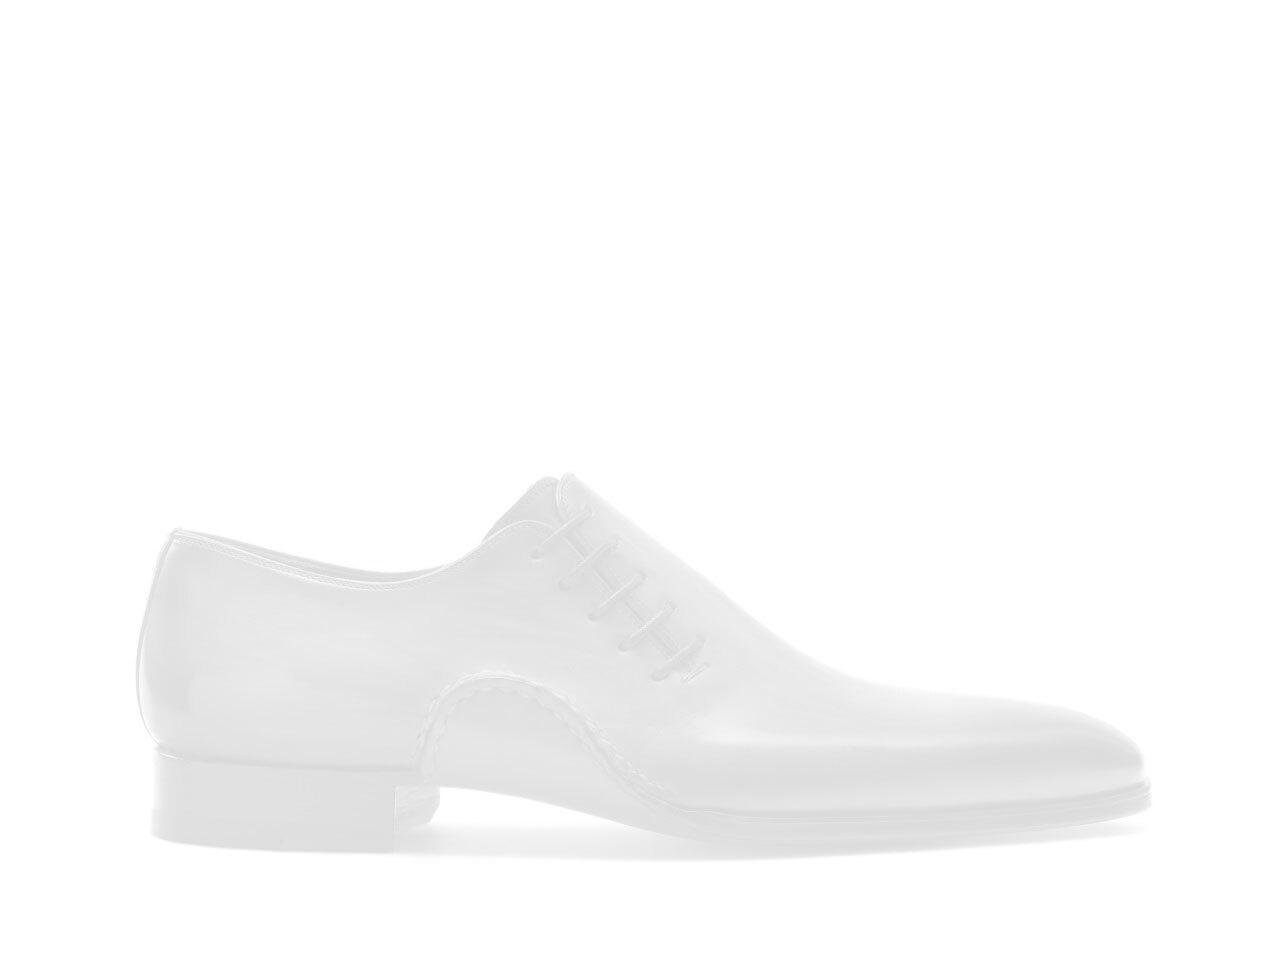 Sole of the Magnanni Ledger Curri Men's Oxford Shoes